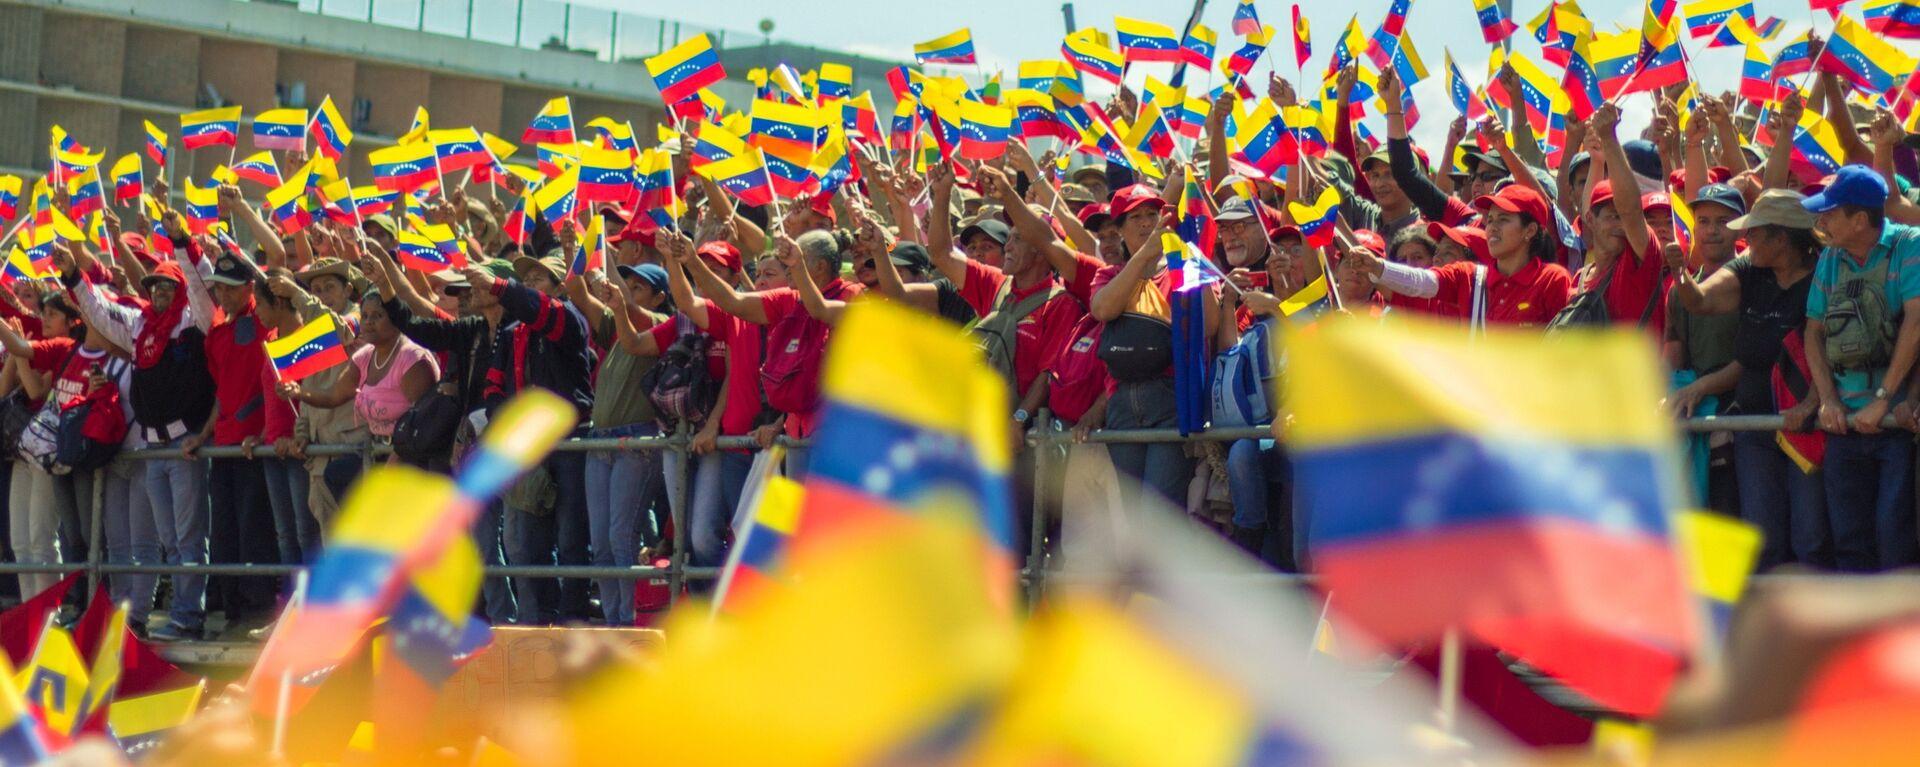 Manifestantes con las banderas de Venezuela - Sputnik Mundo, 1920, 24.08.2021